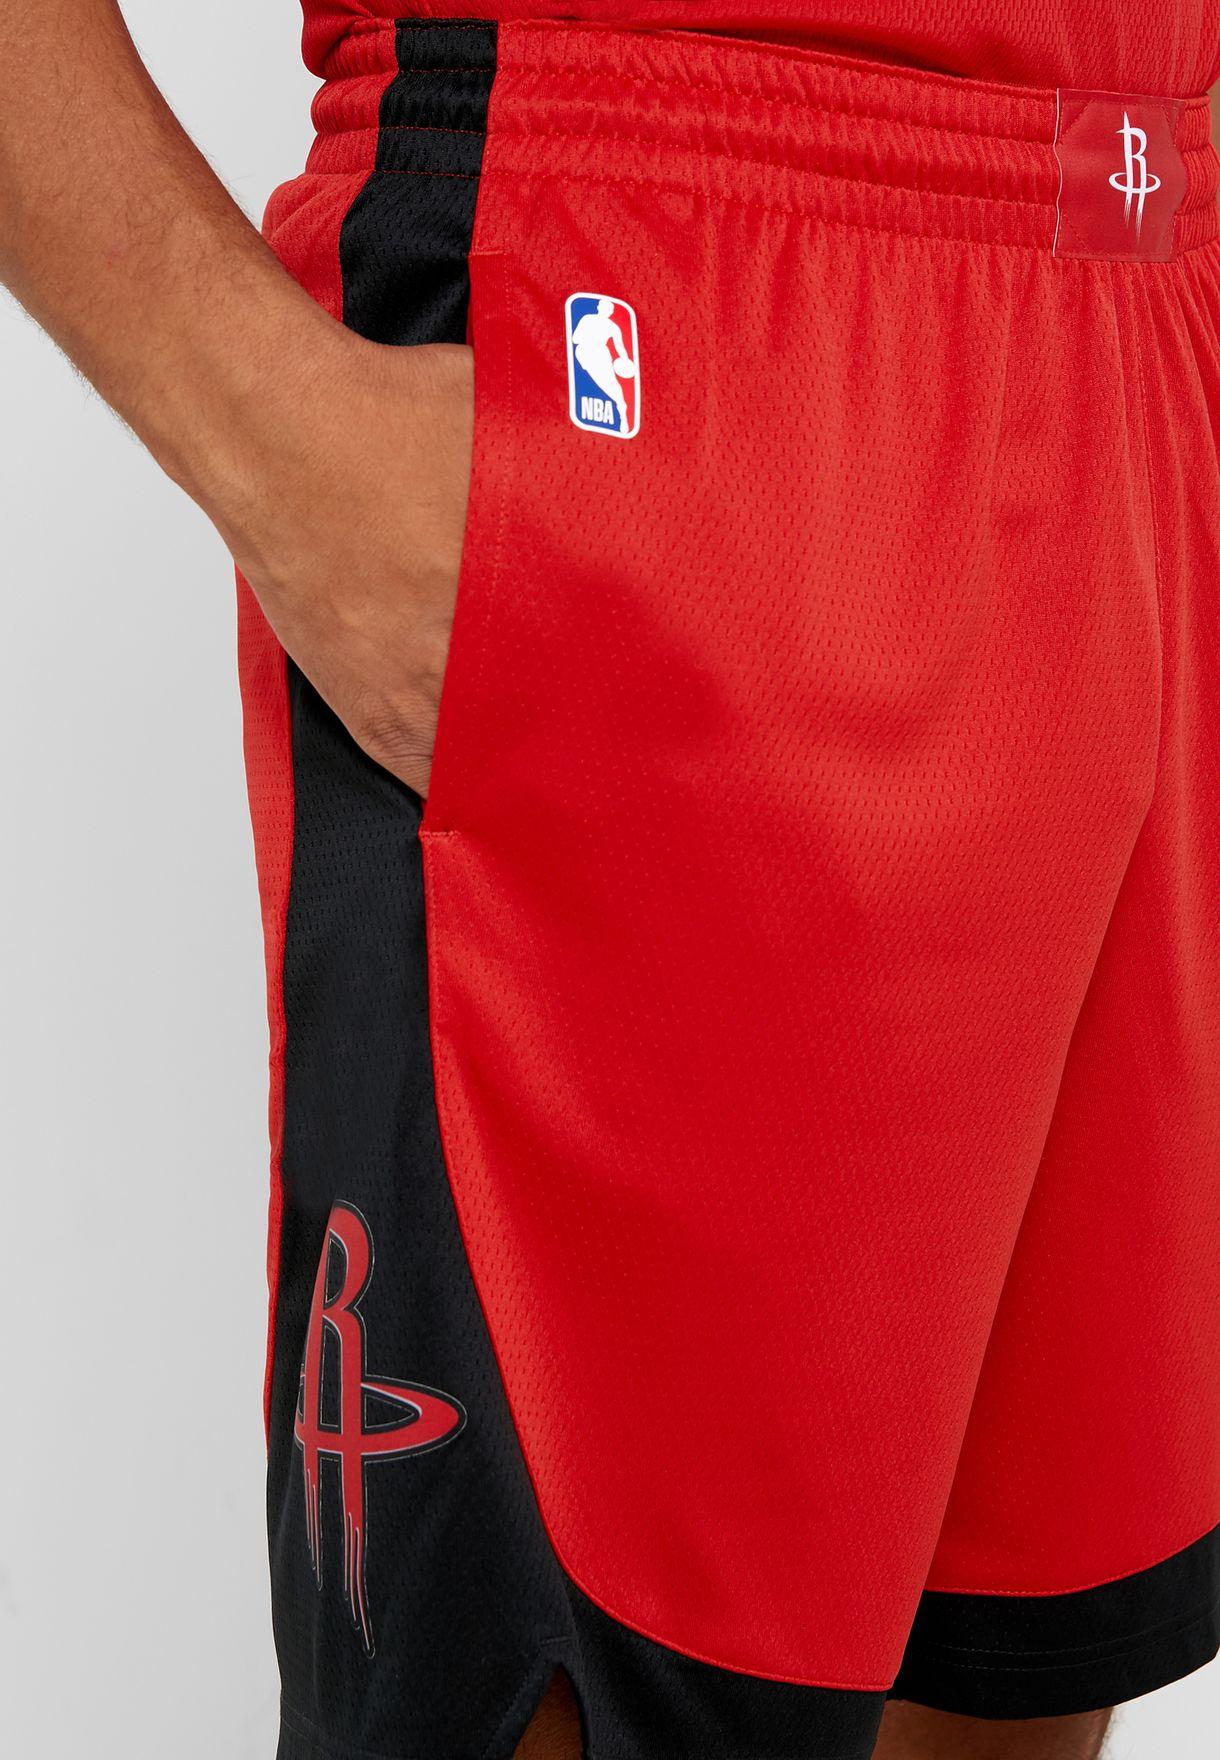 Houston Rockets Swingman Shorts